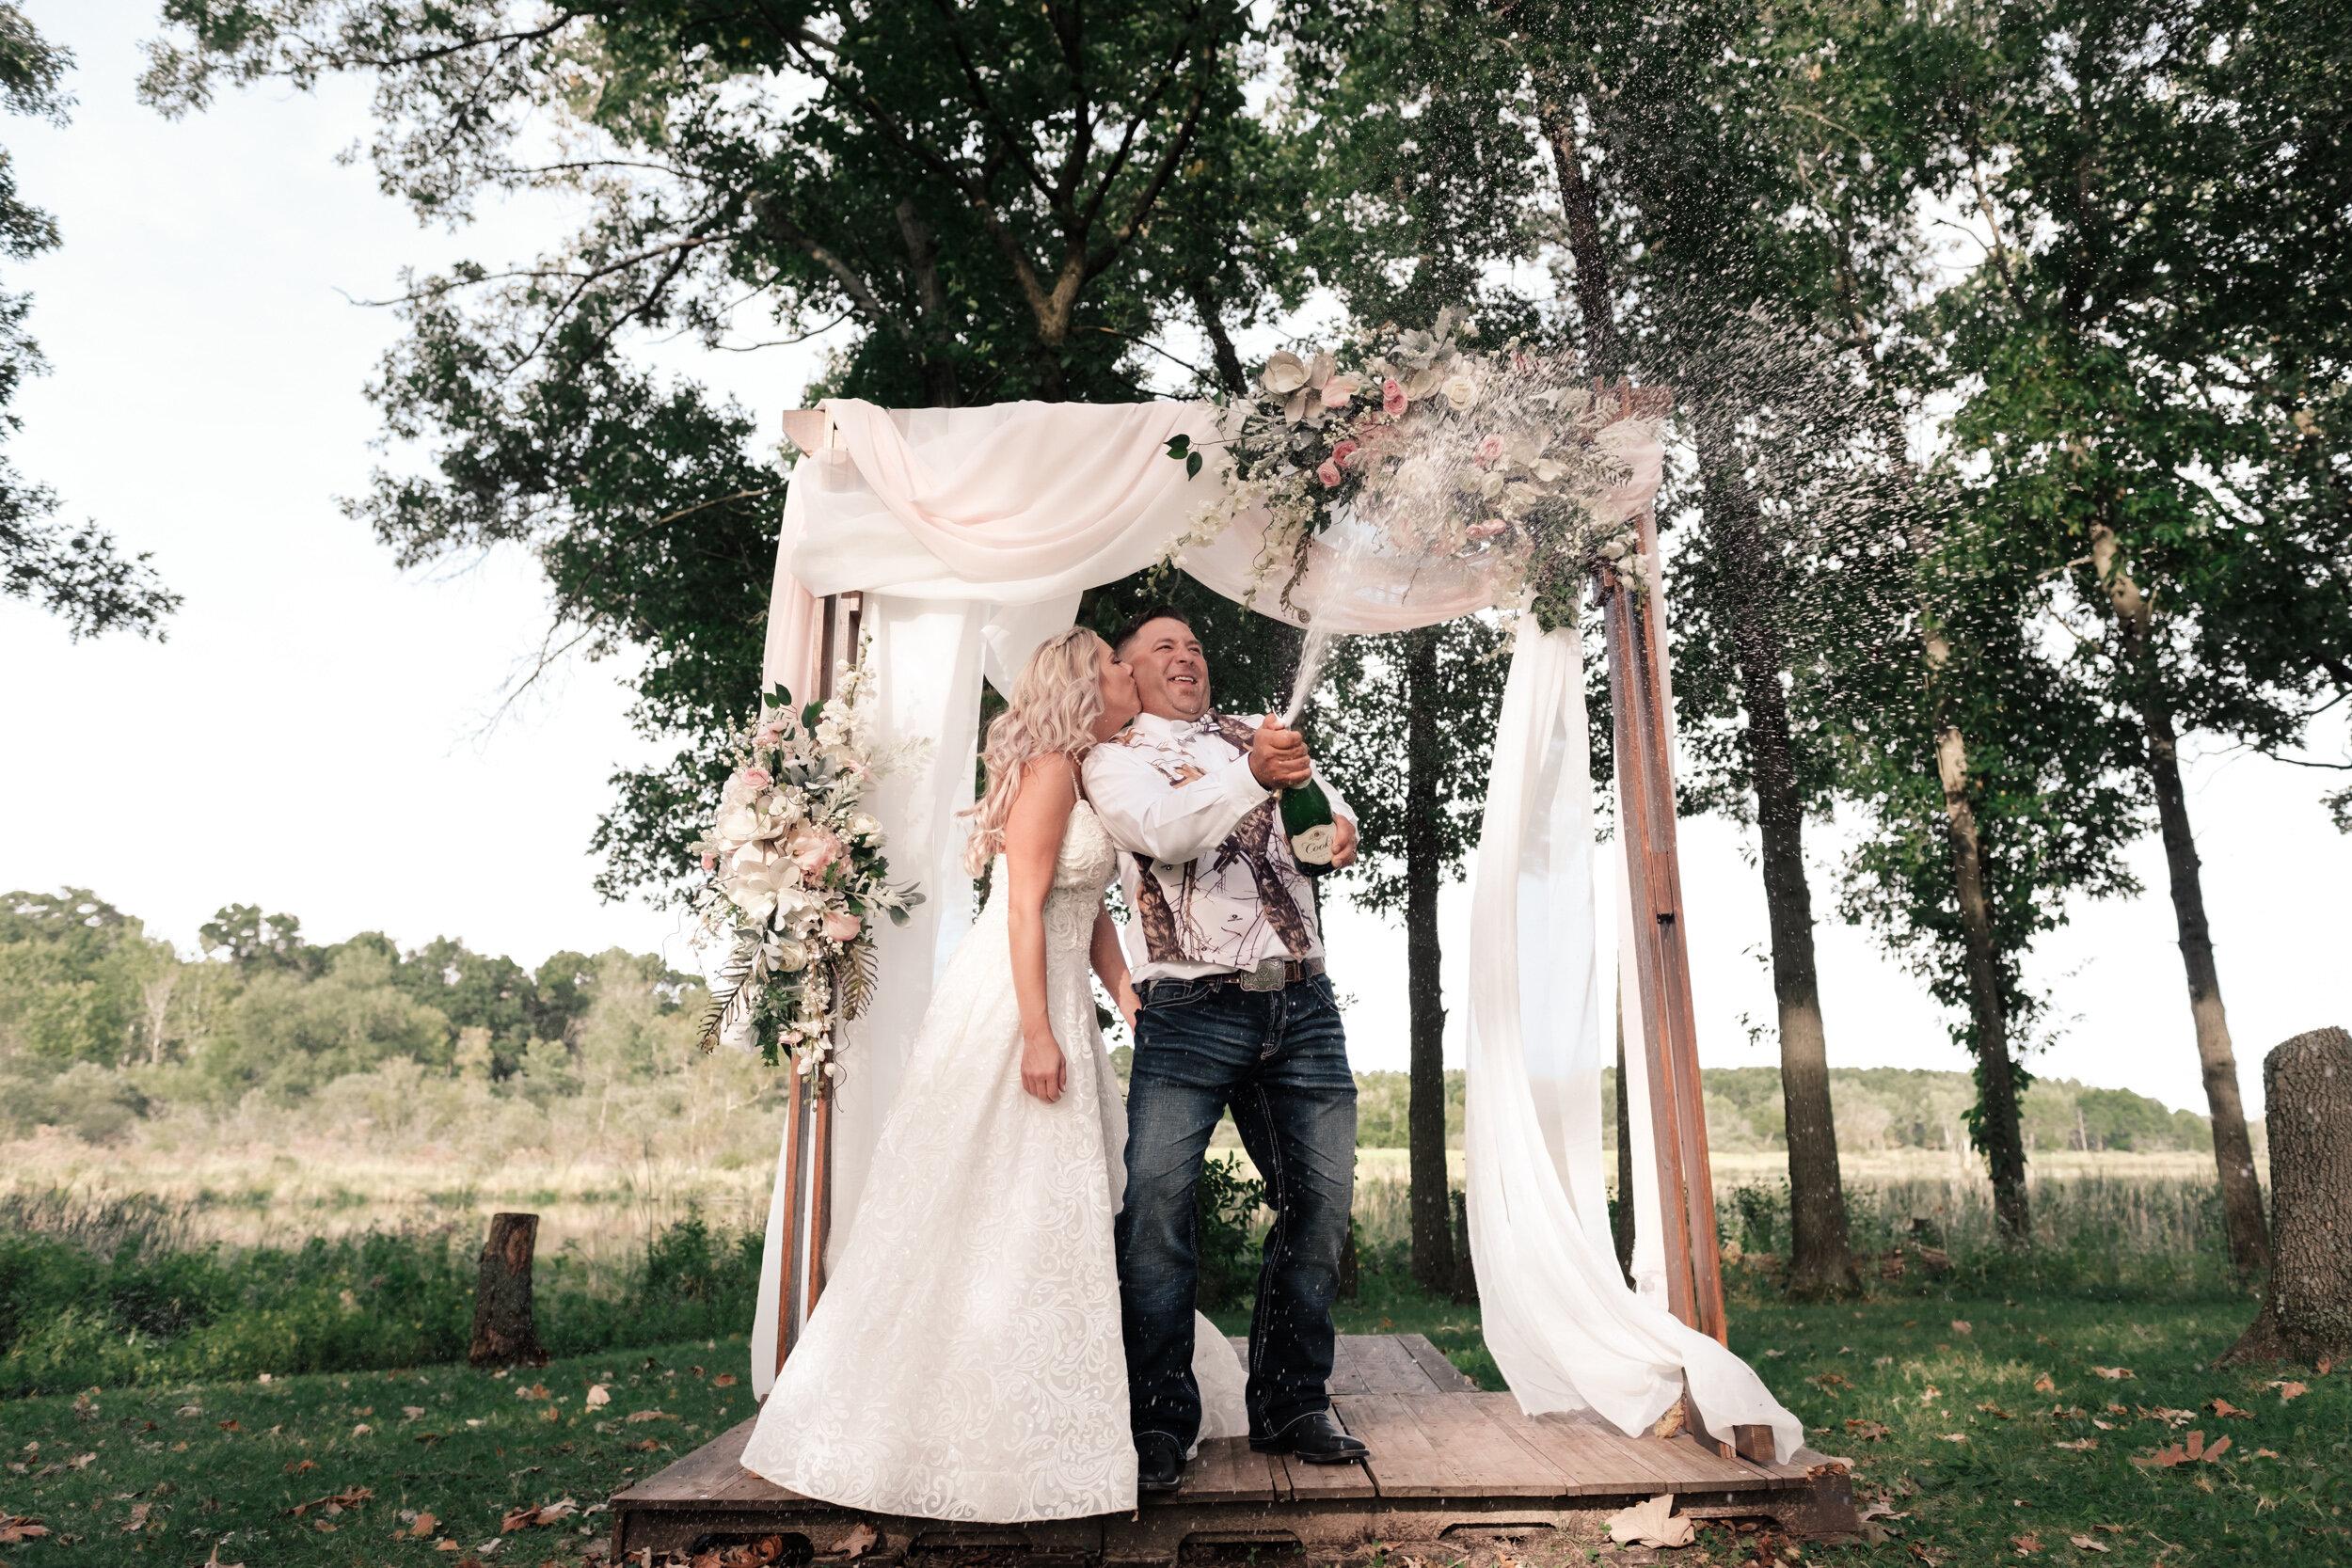 19-09-14 Rebecca & Karl Old Coon Creek Wedding-14.jpg